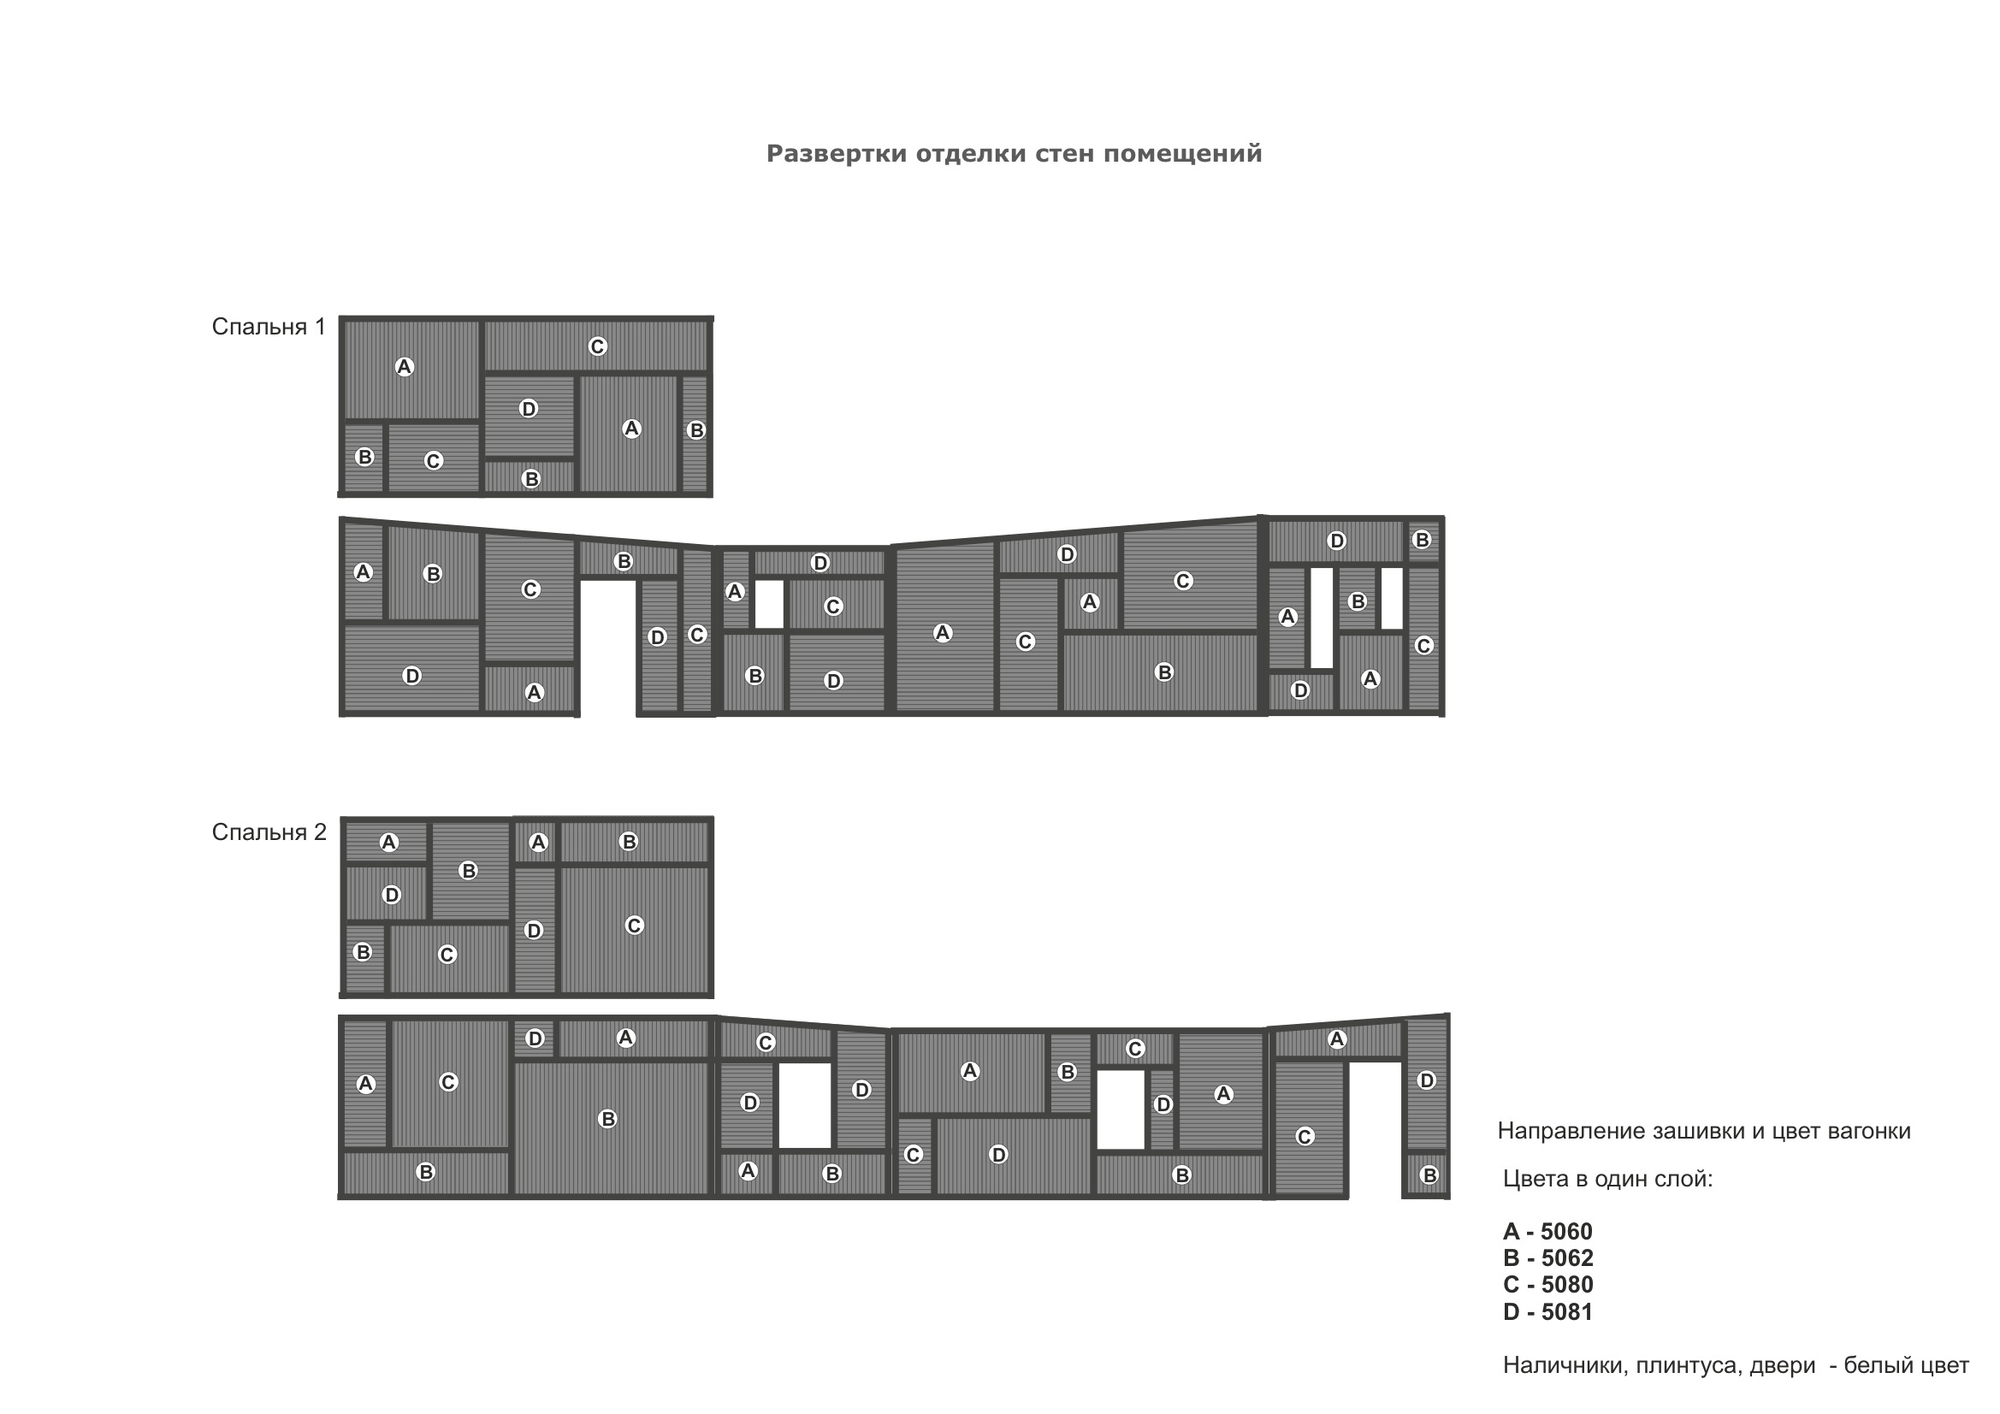 51ef1072e8e44e6da3000089_deco-pattern-house-peter-kostelov_fa-ade_panels_03